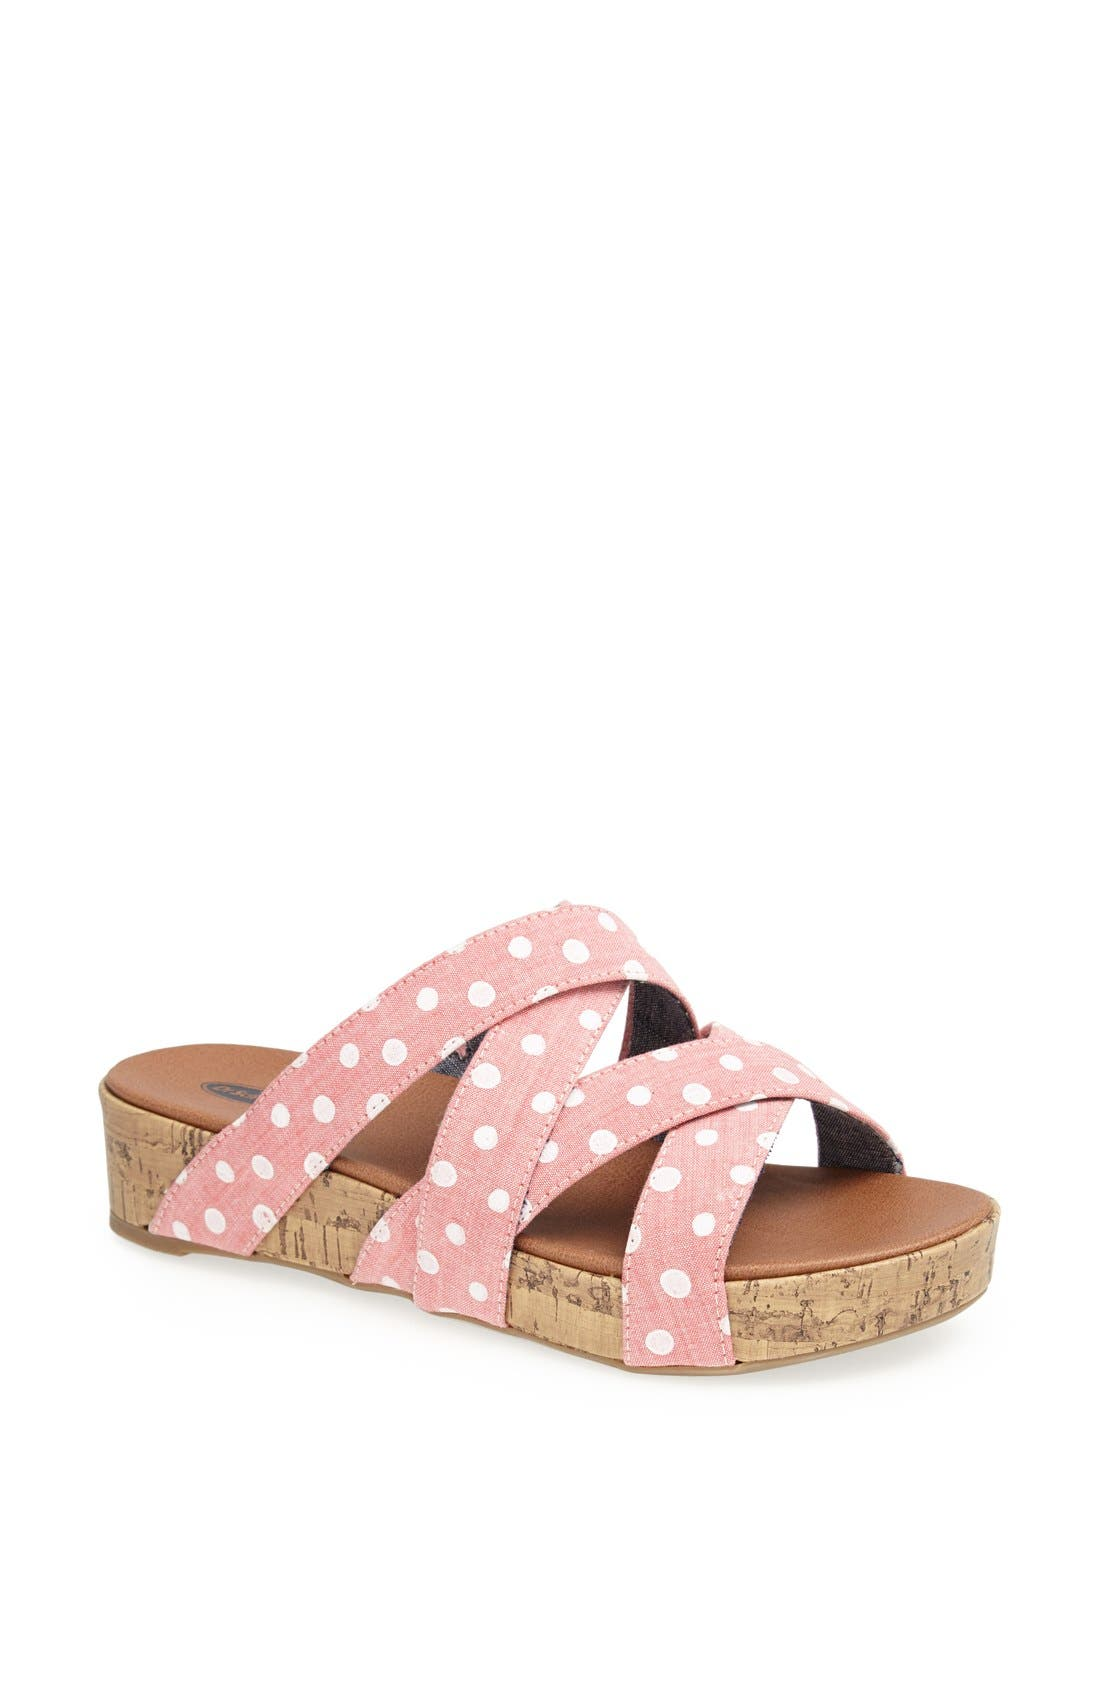 Main Image - Dr. Scholl's 'Freshen' Sandal